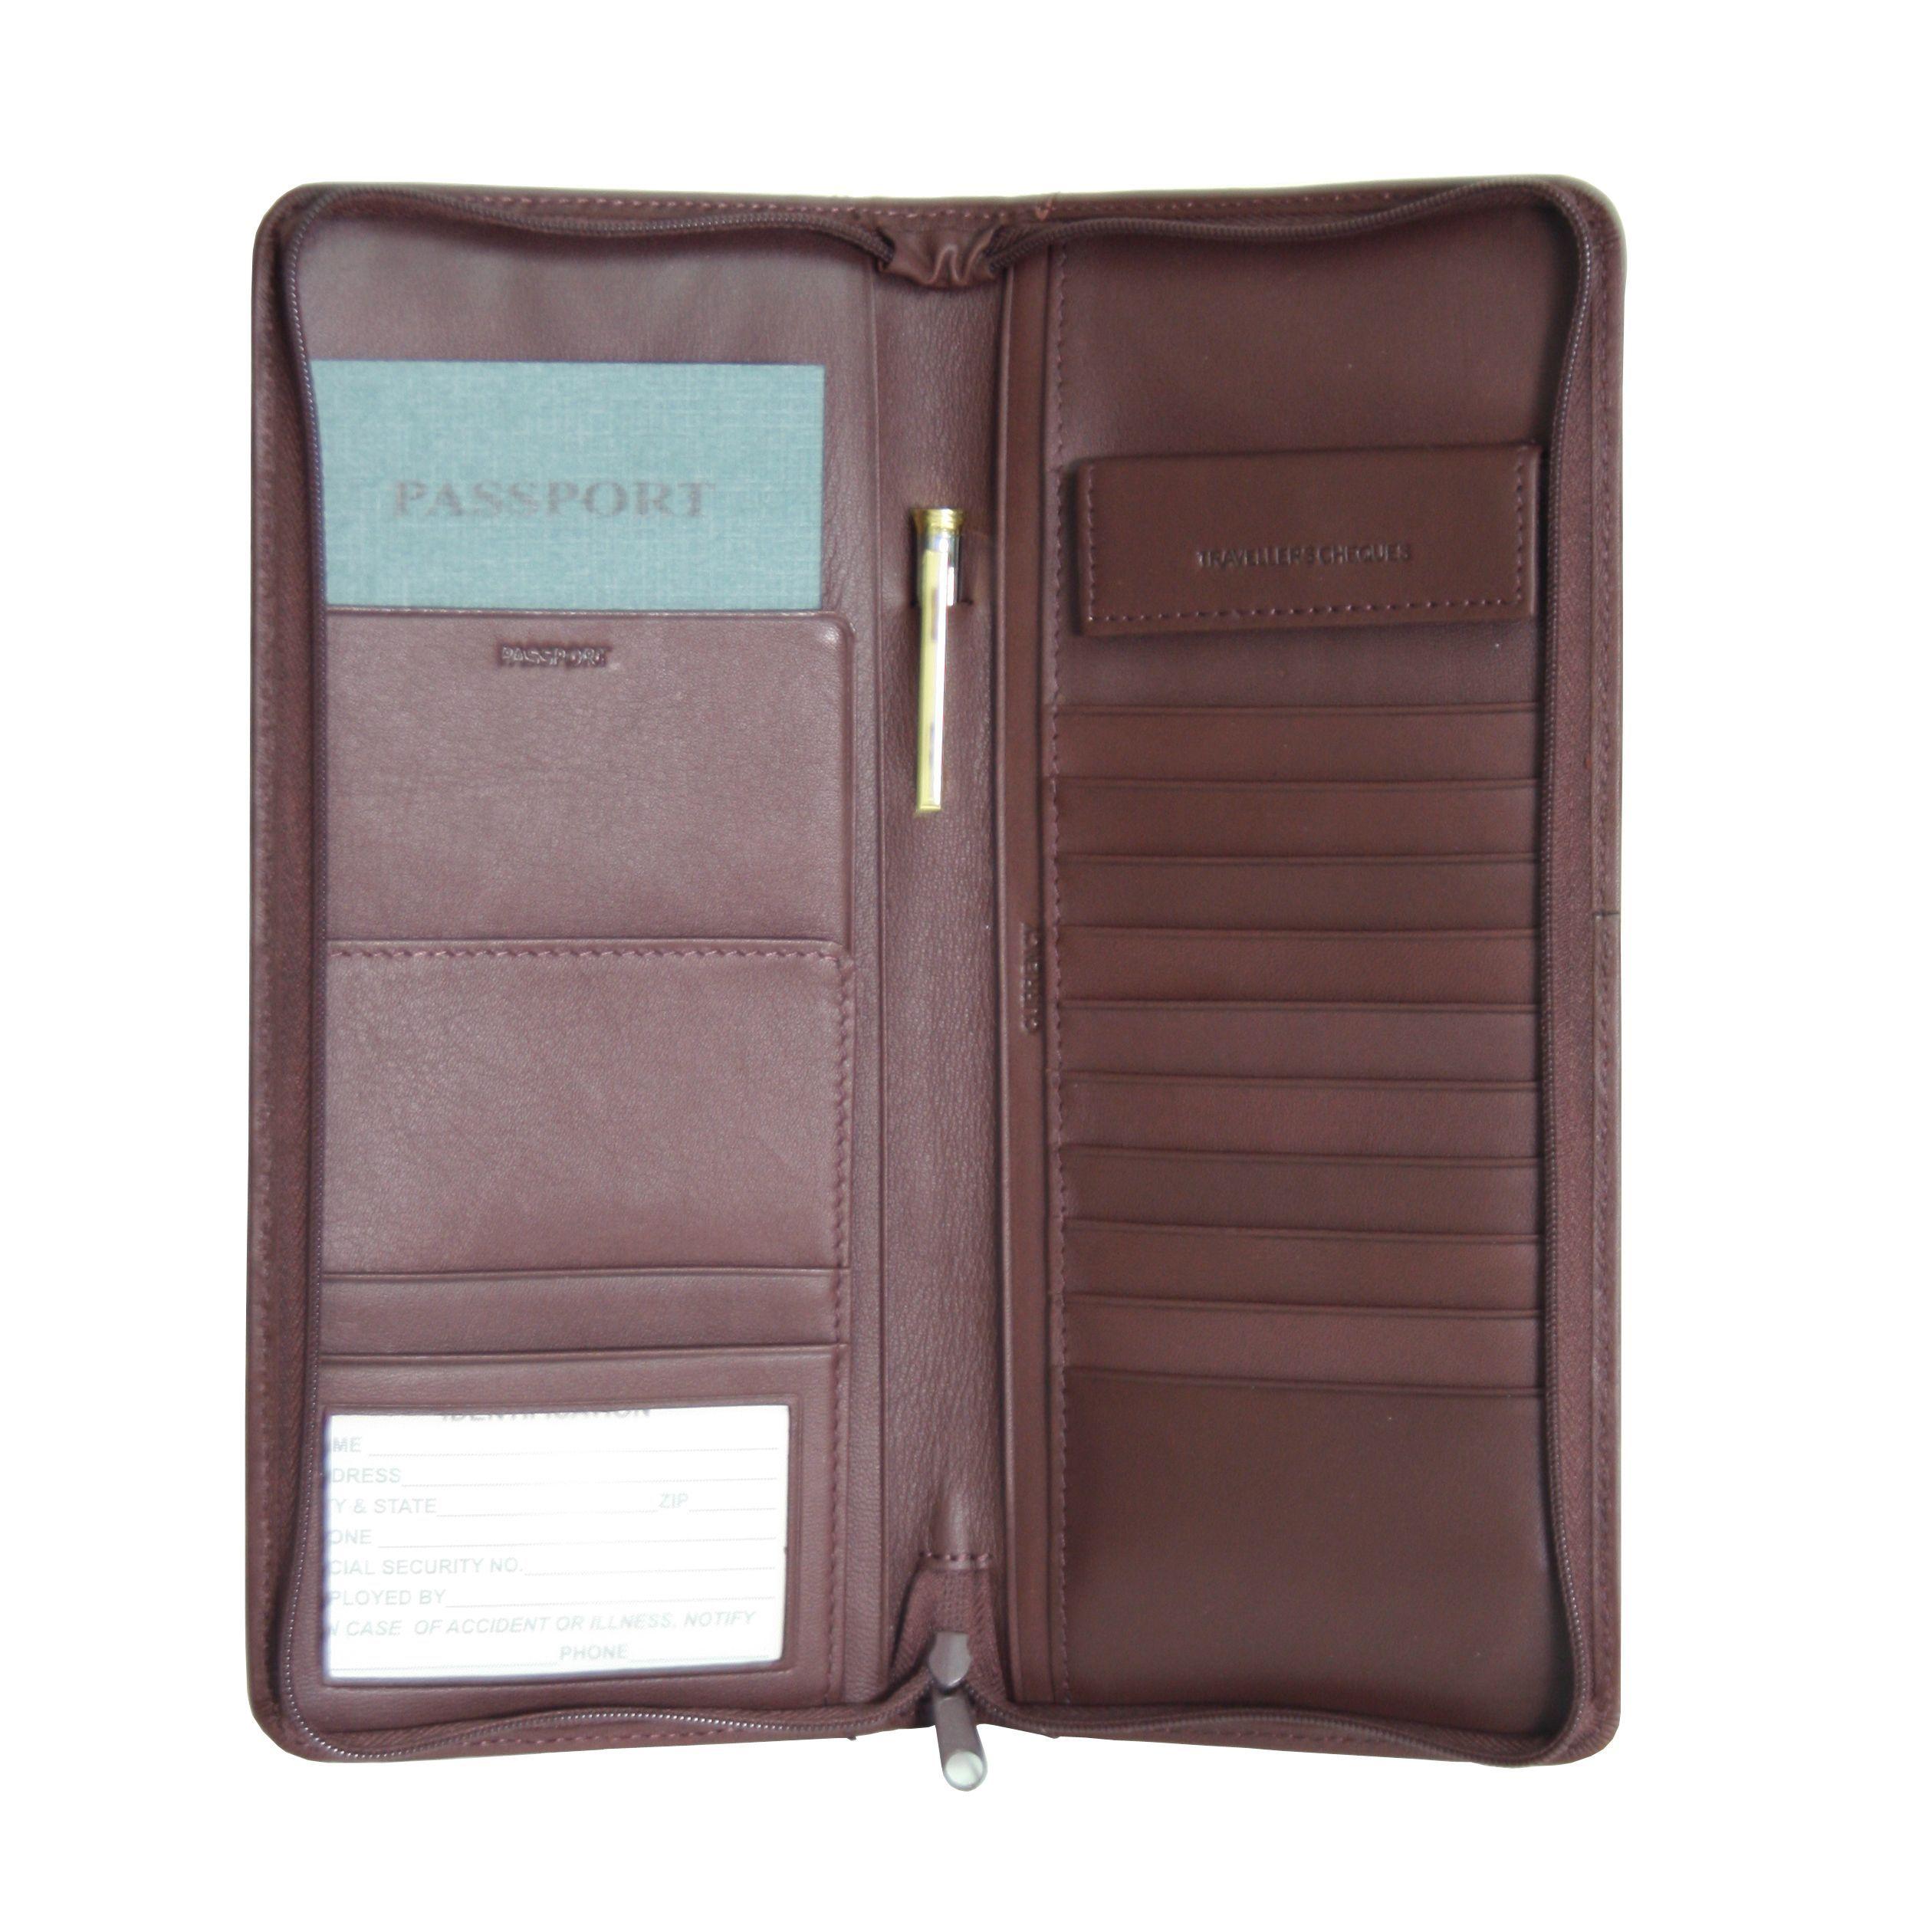 Royce executive zippered travel document passport genuine